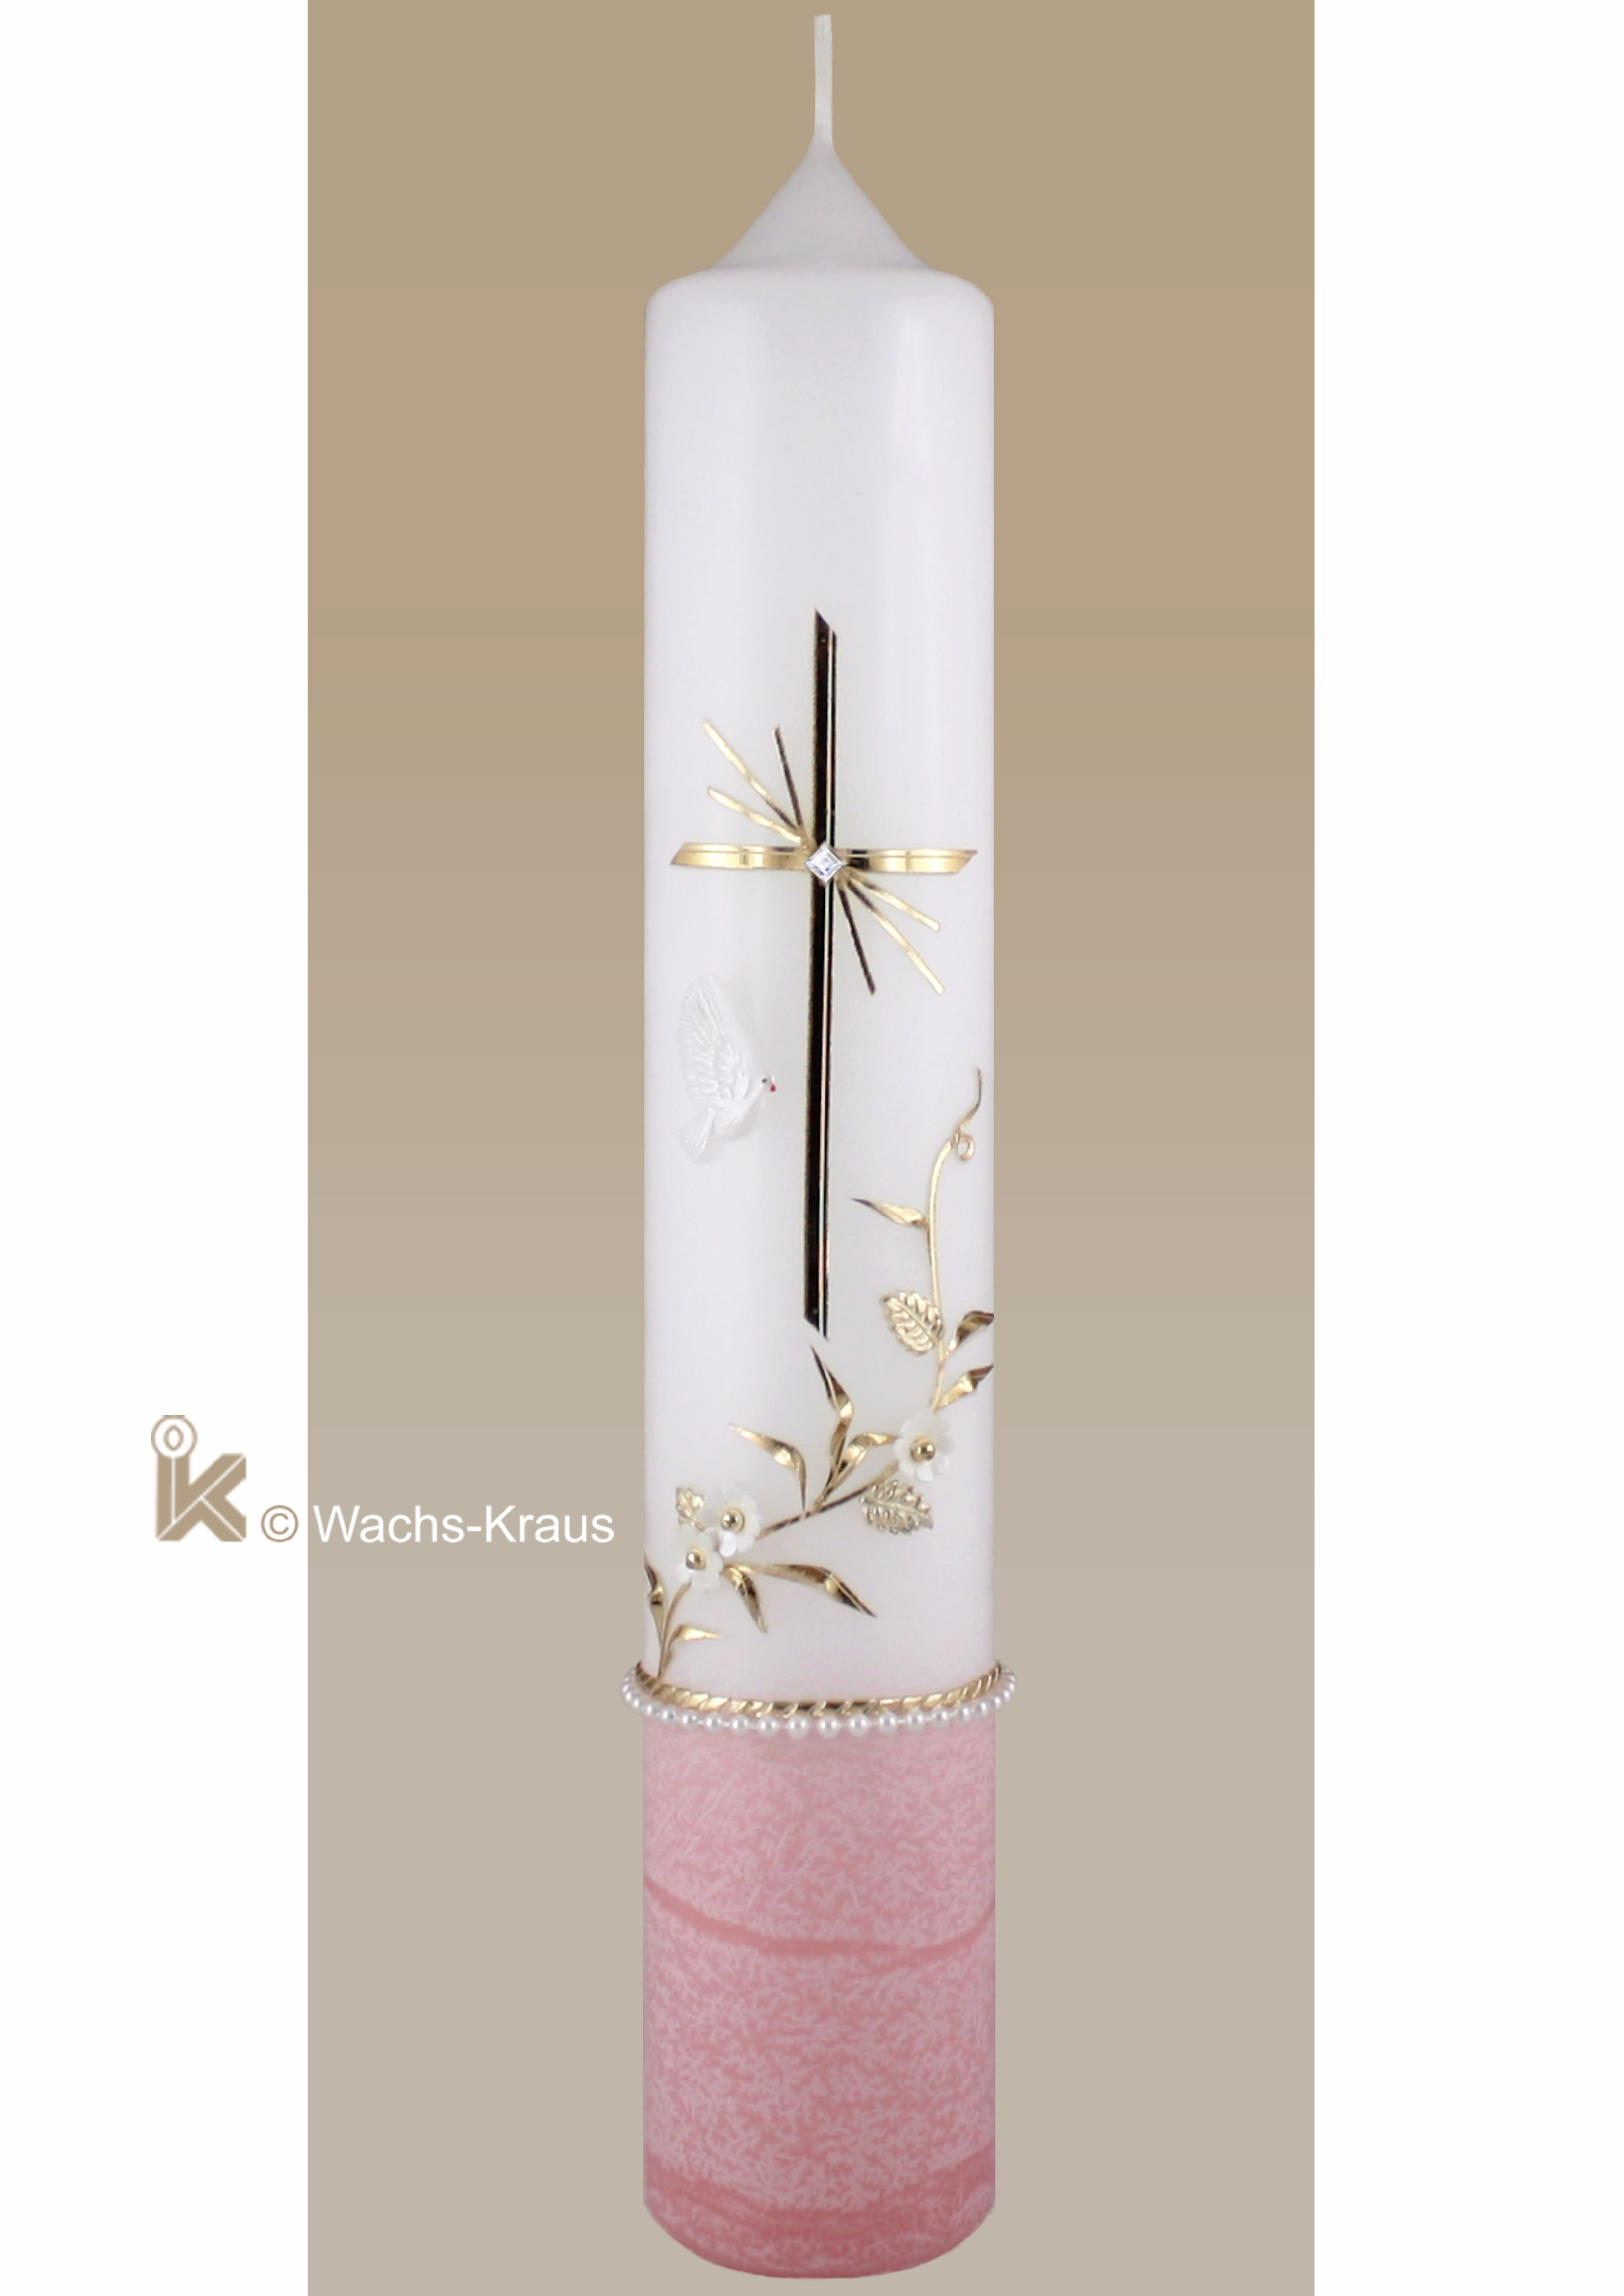 Taufkerze Mädchen oval Kreuz Schmetterlinge Blumen rosa